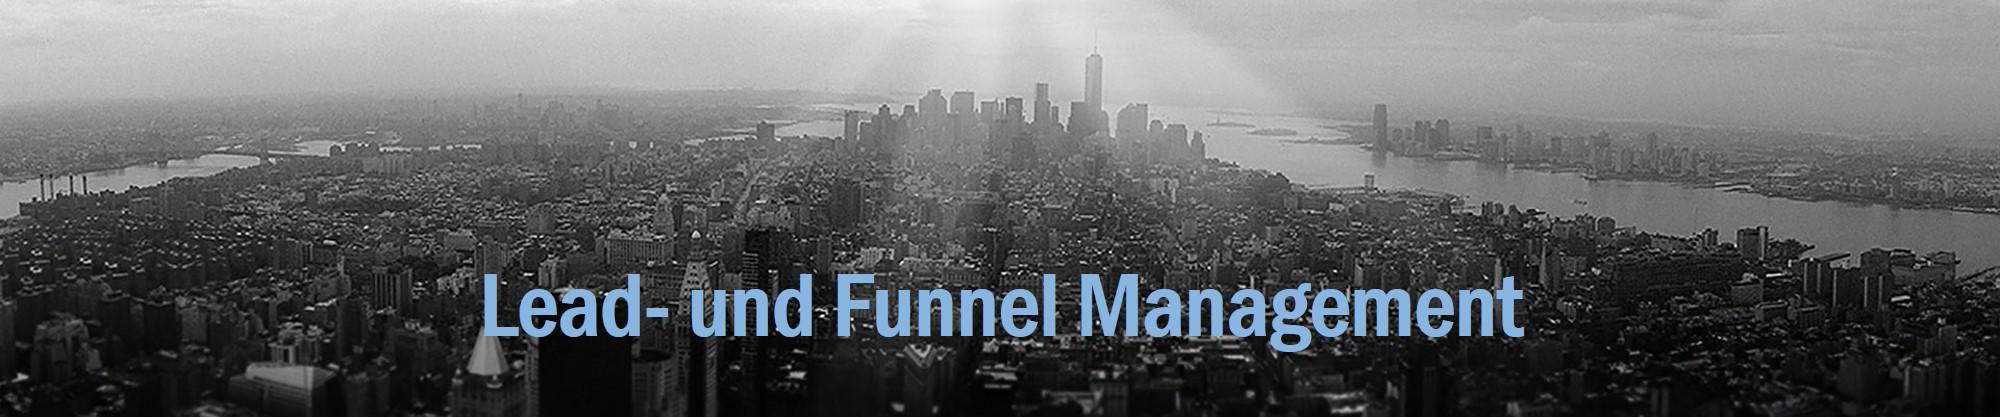 Lead und Funnel Management_SonjaDirr_apricot.jpg